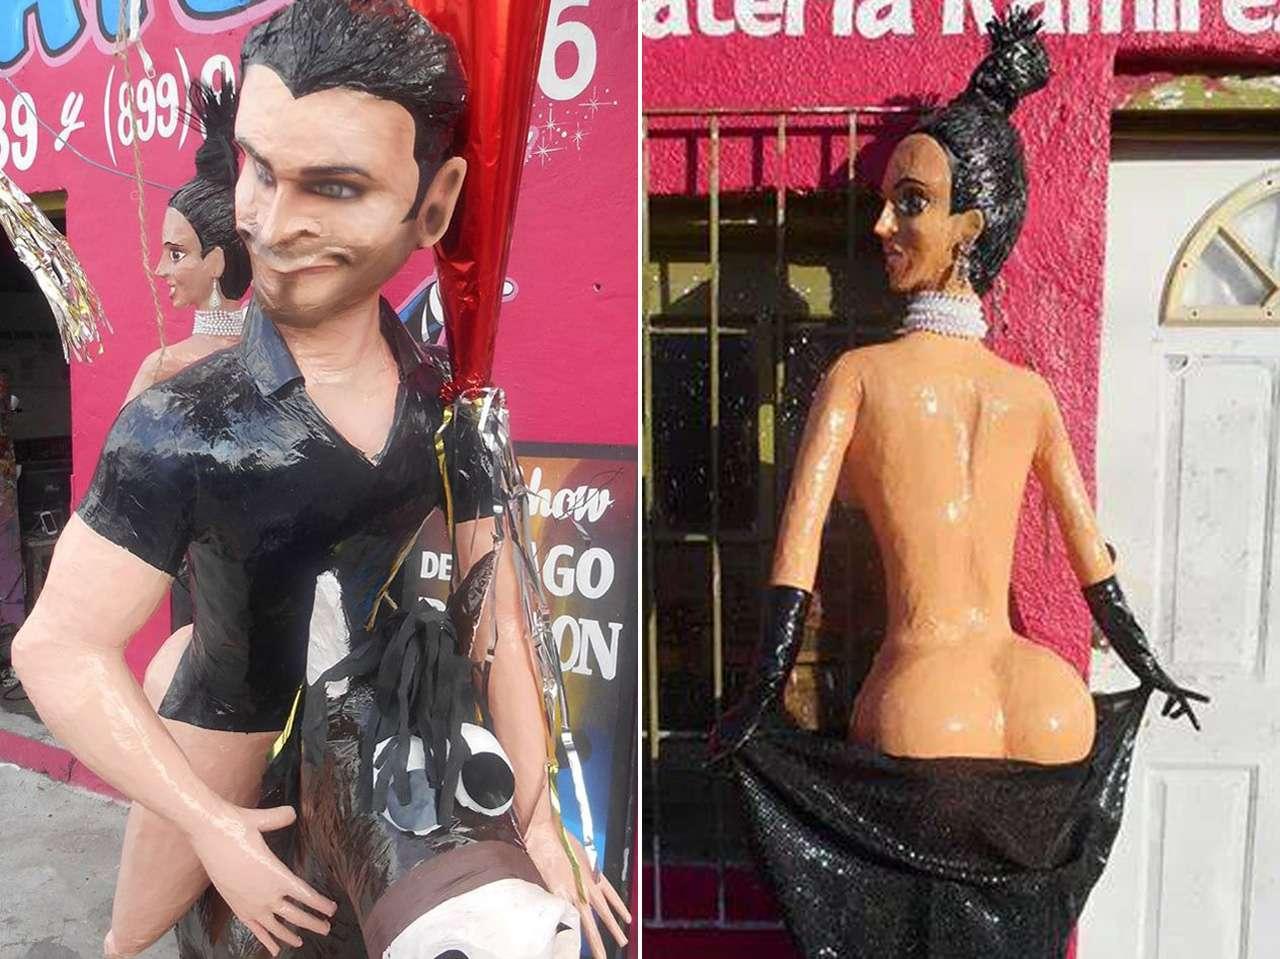 piñatas kim kardashian eliseo robles jr Foto: Facebook / Piñatería Ramírez